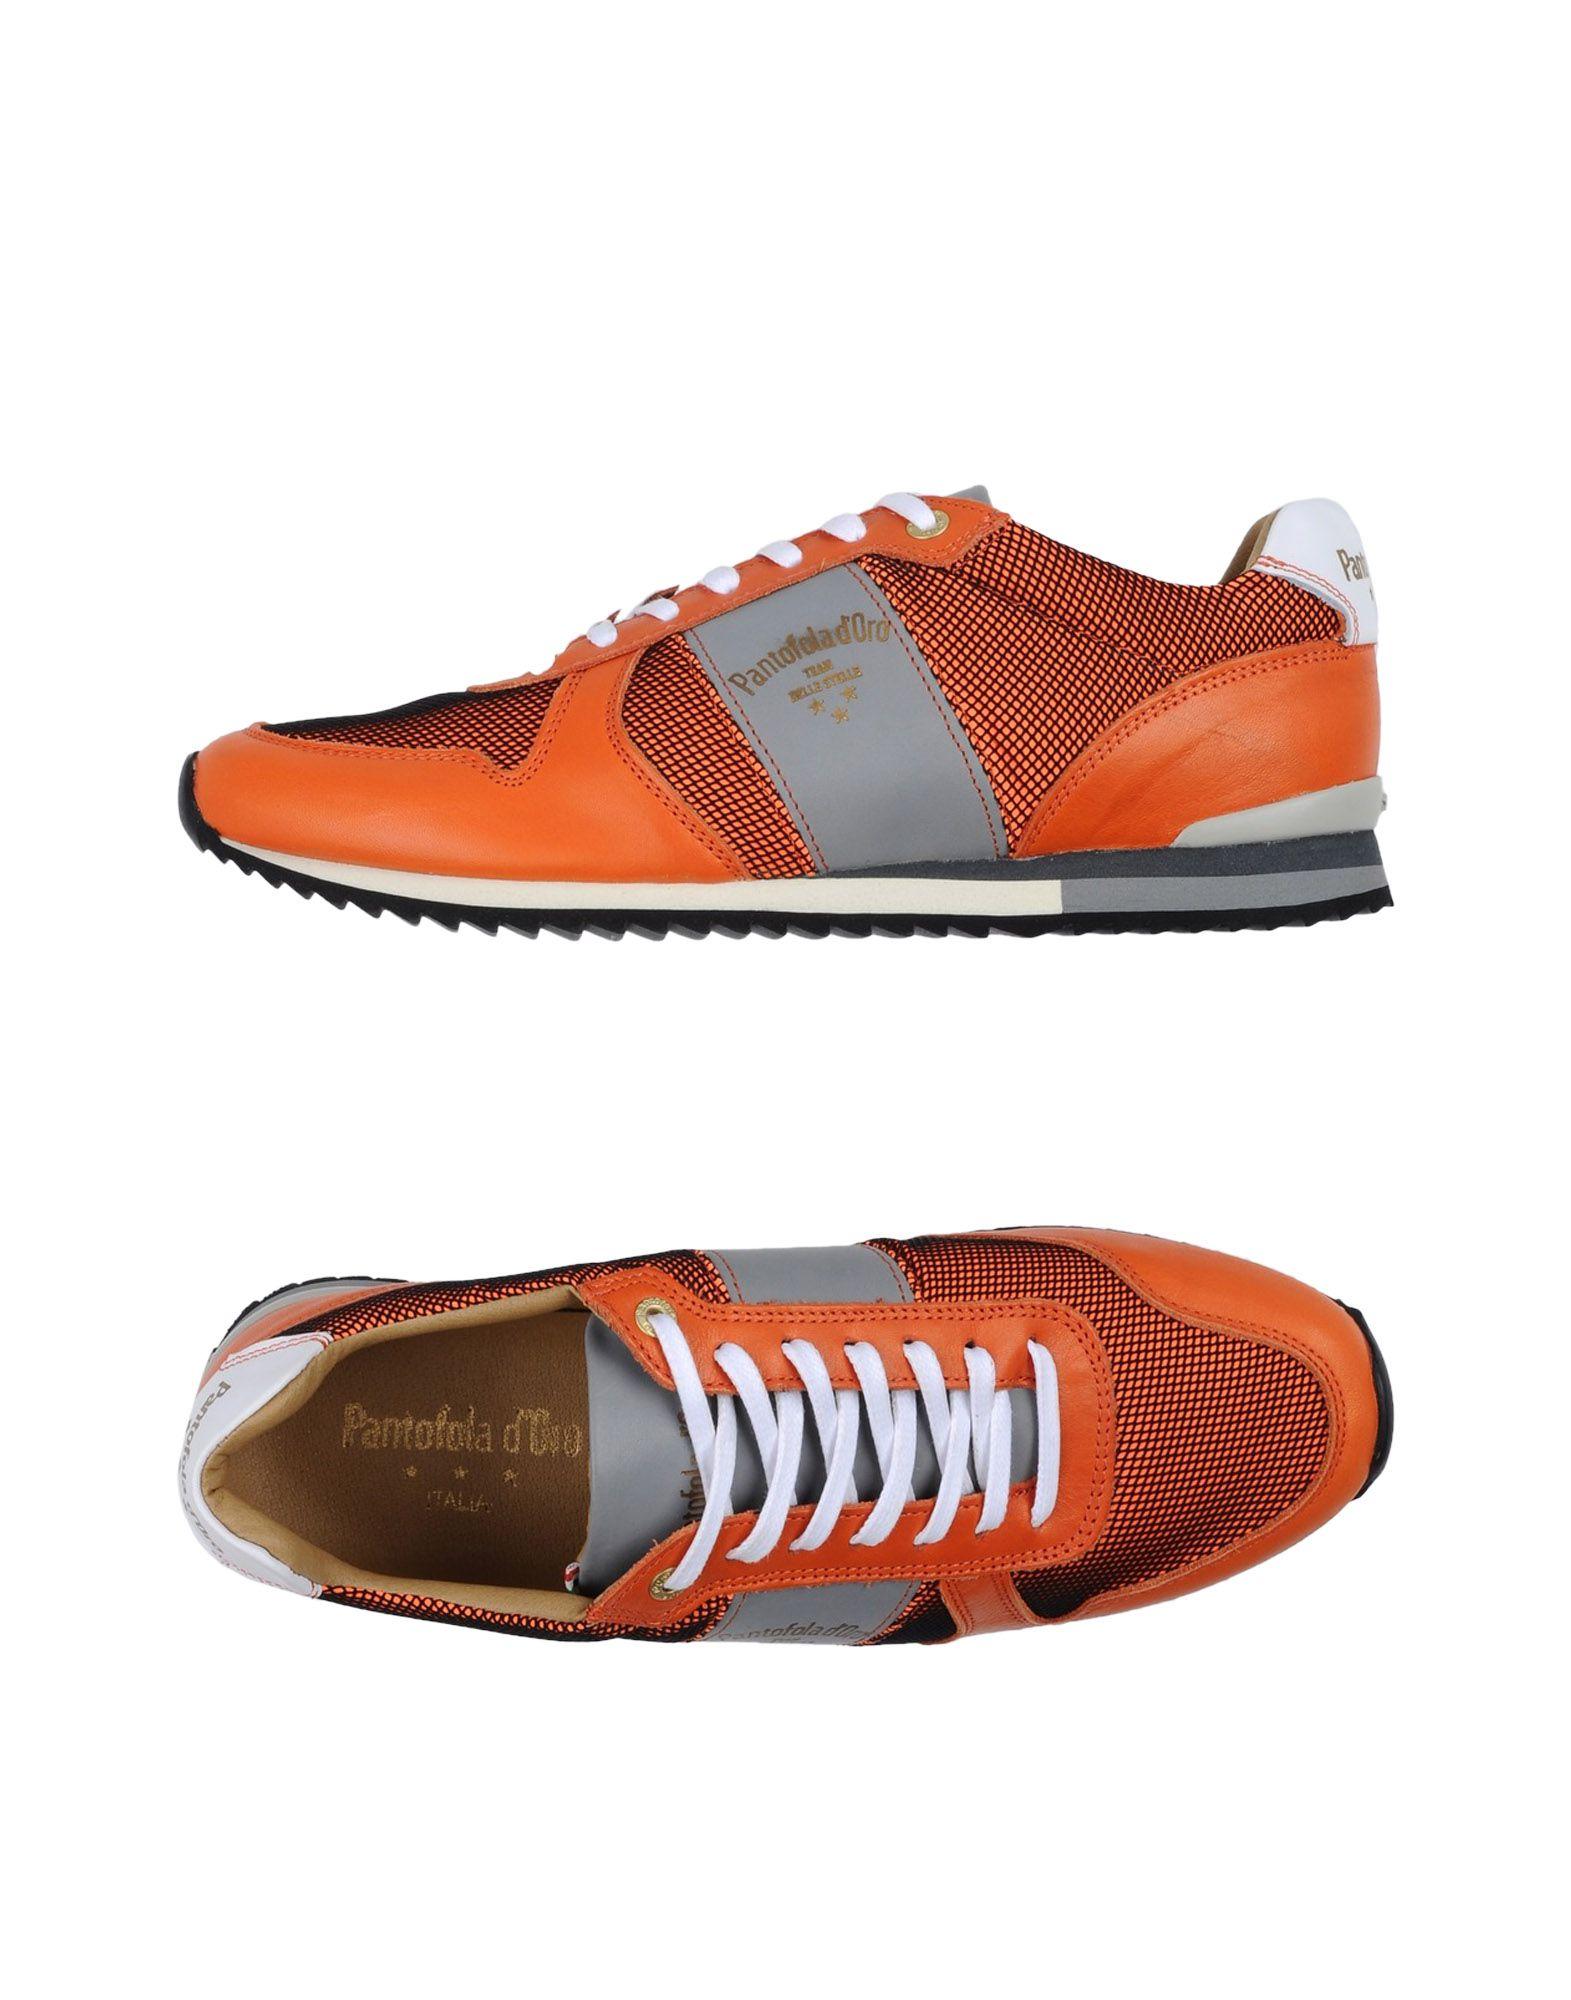 Pantofola D'oro Sneakers Herren  11339373NX Neue Schuhe